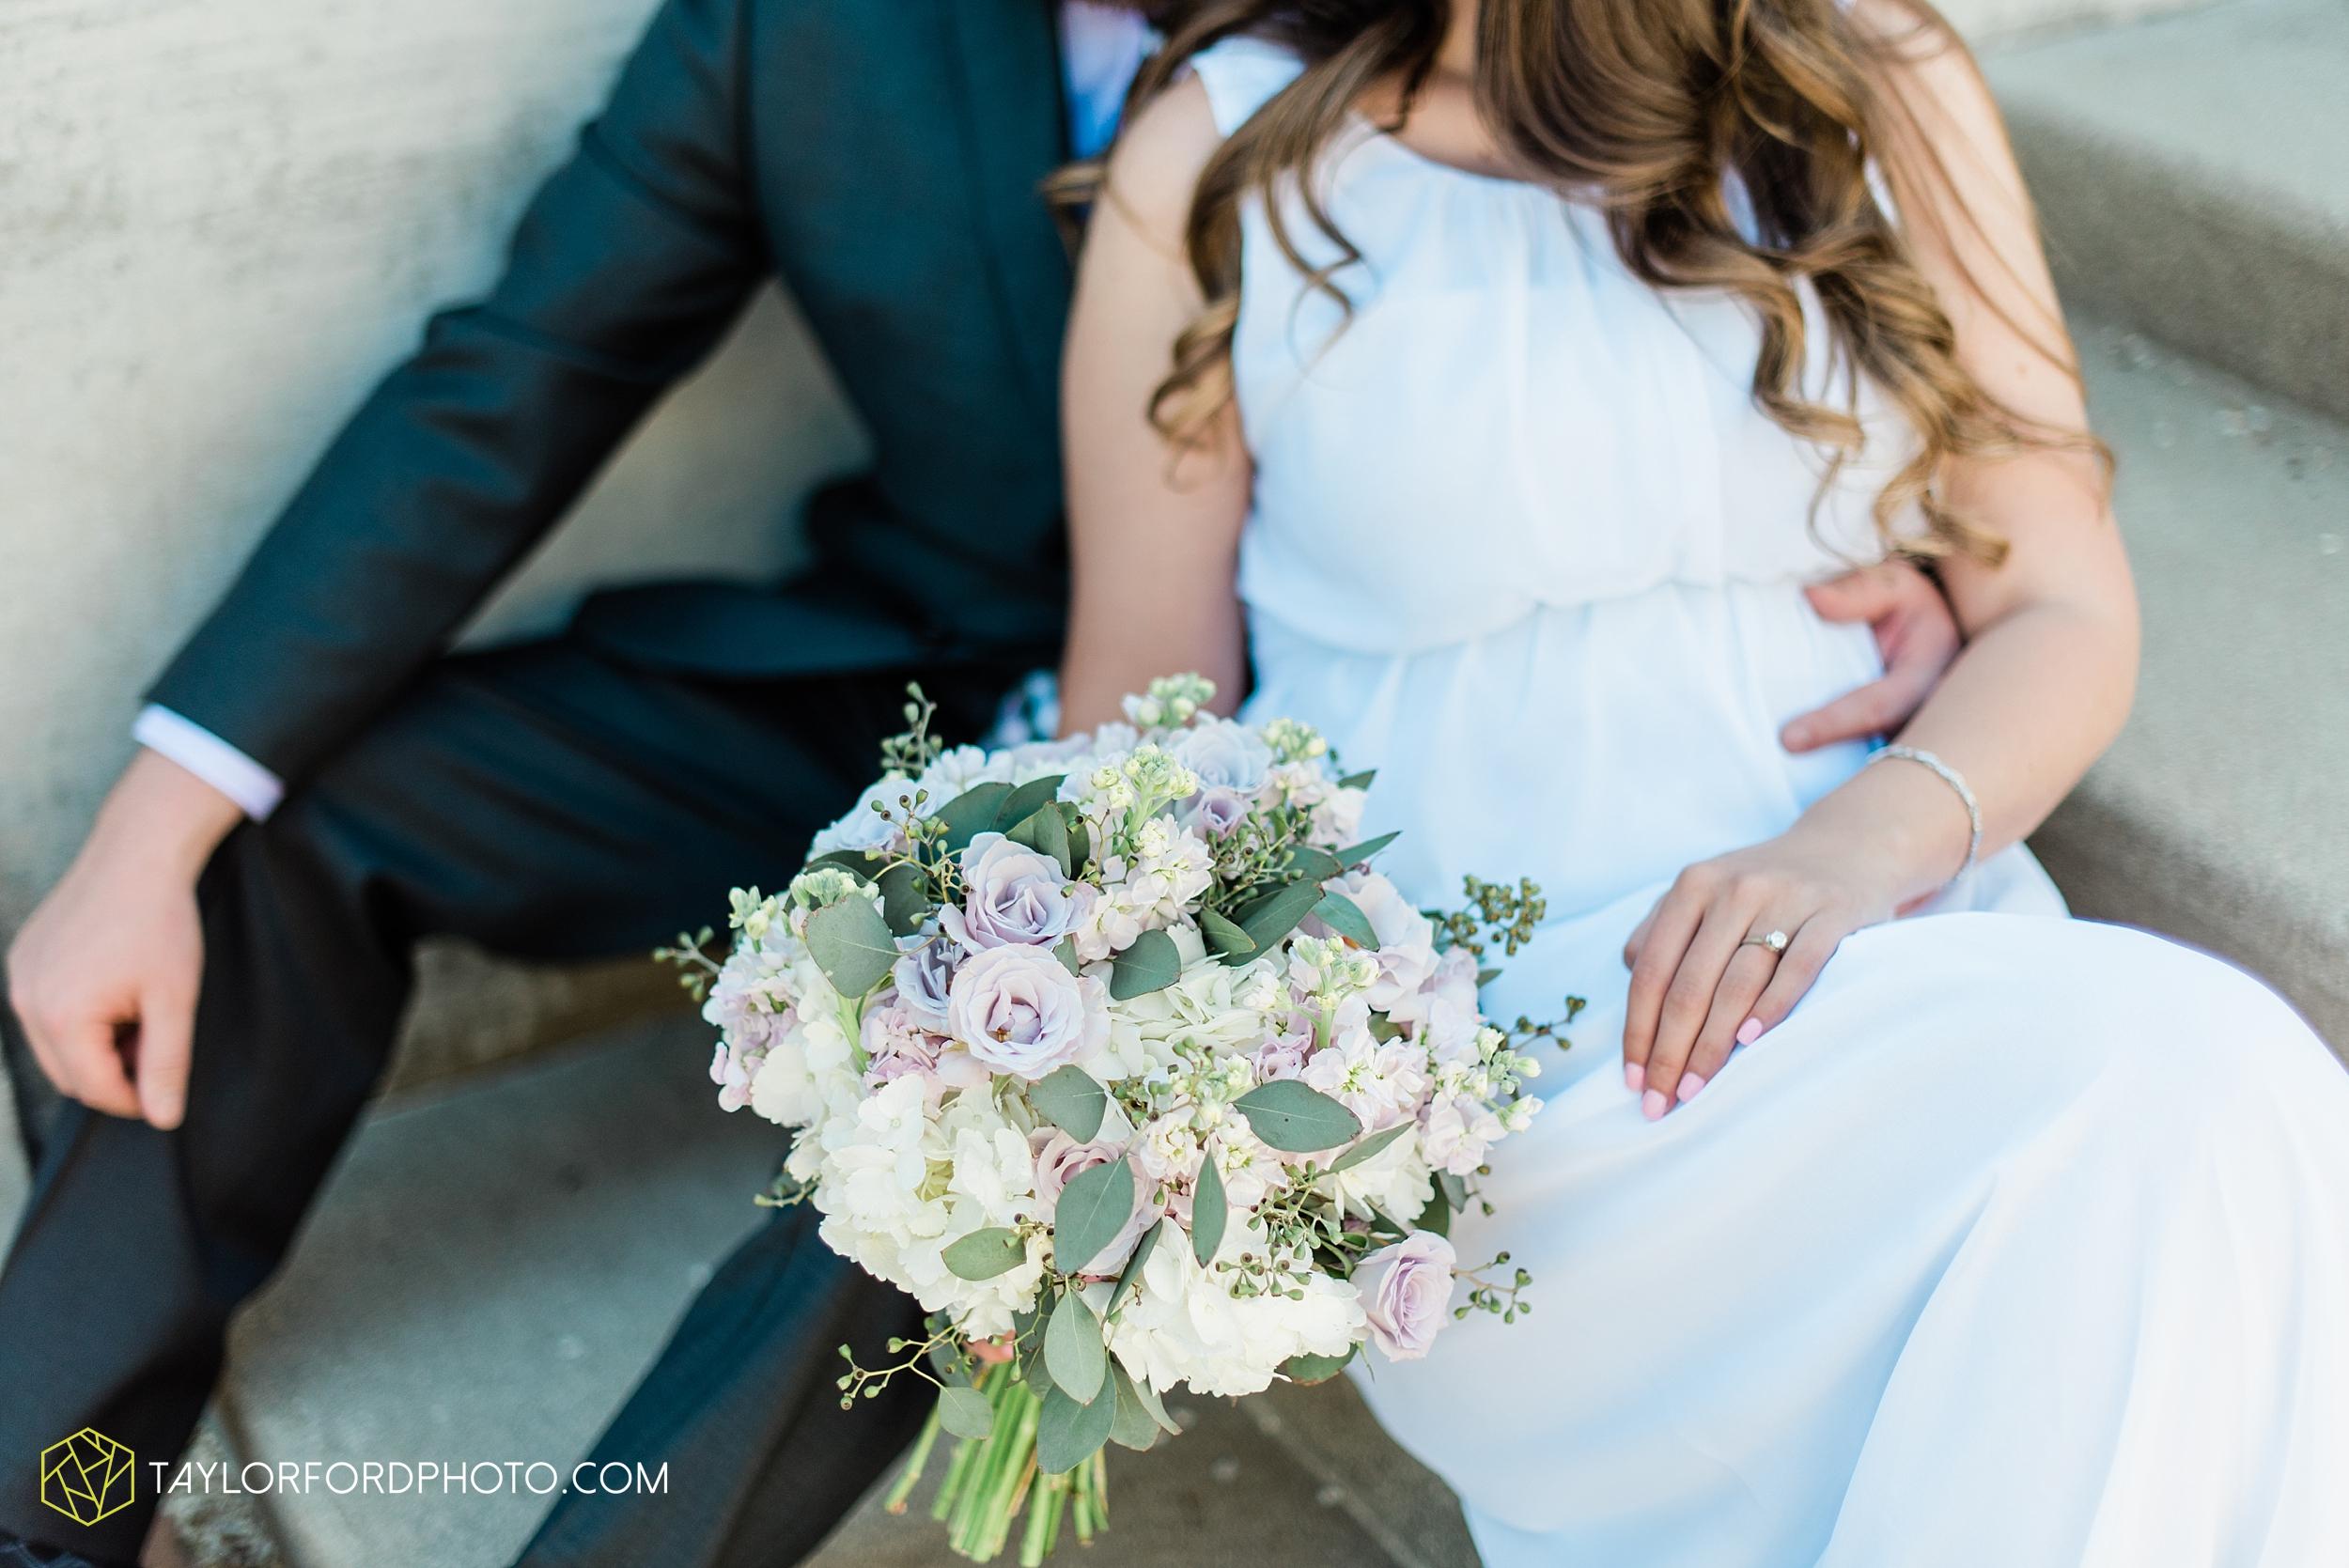 lakeside-rose-gardens-fort-wayne-indiana-elopement-wedding-photographer-Taylor-Ford-Photography_7173.jpg